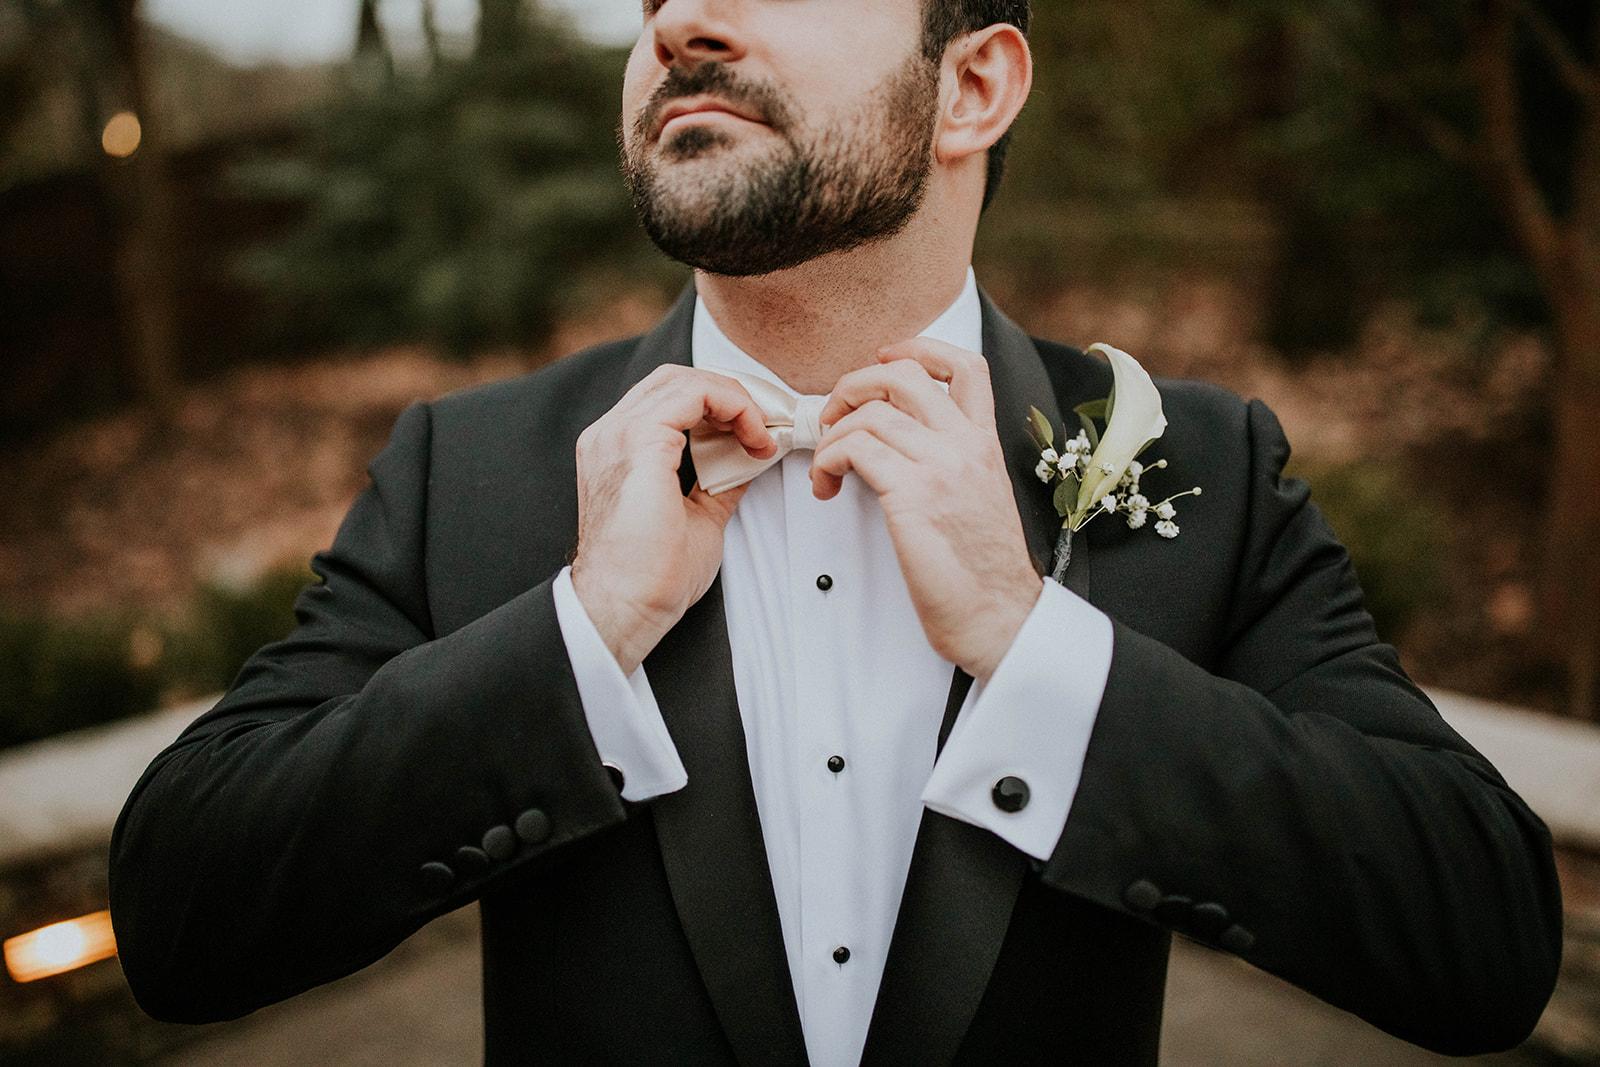 Black and white wedding tuxedo